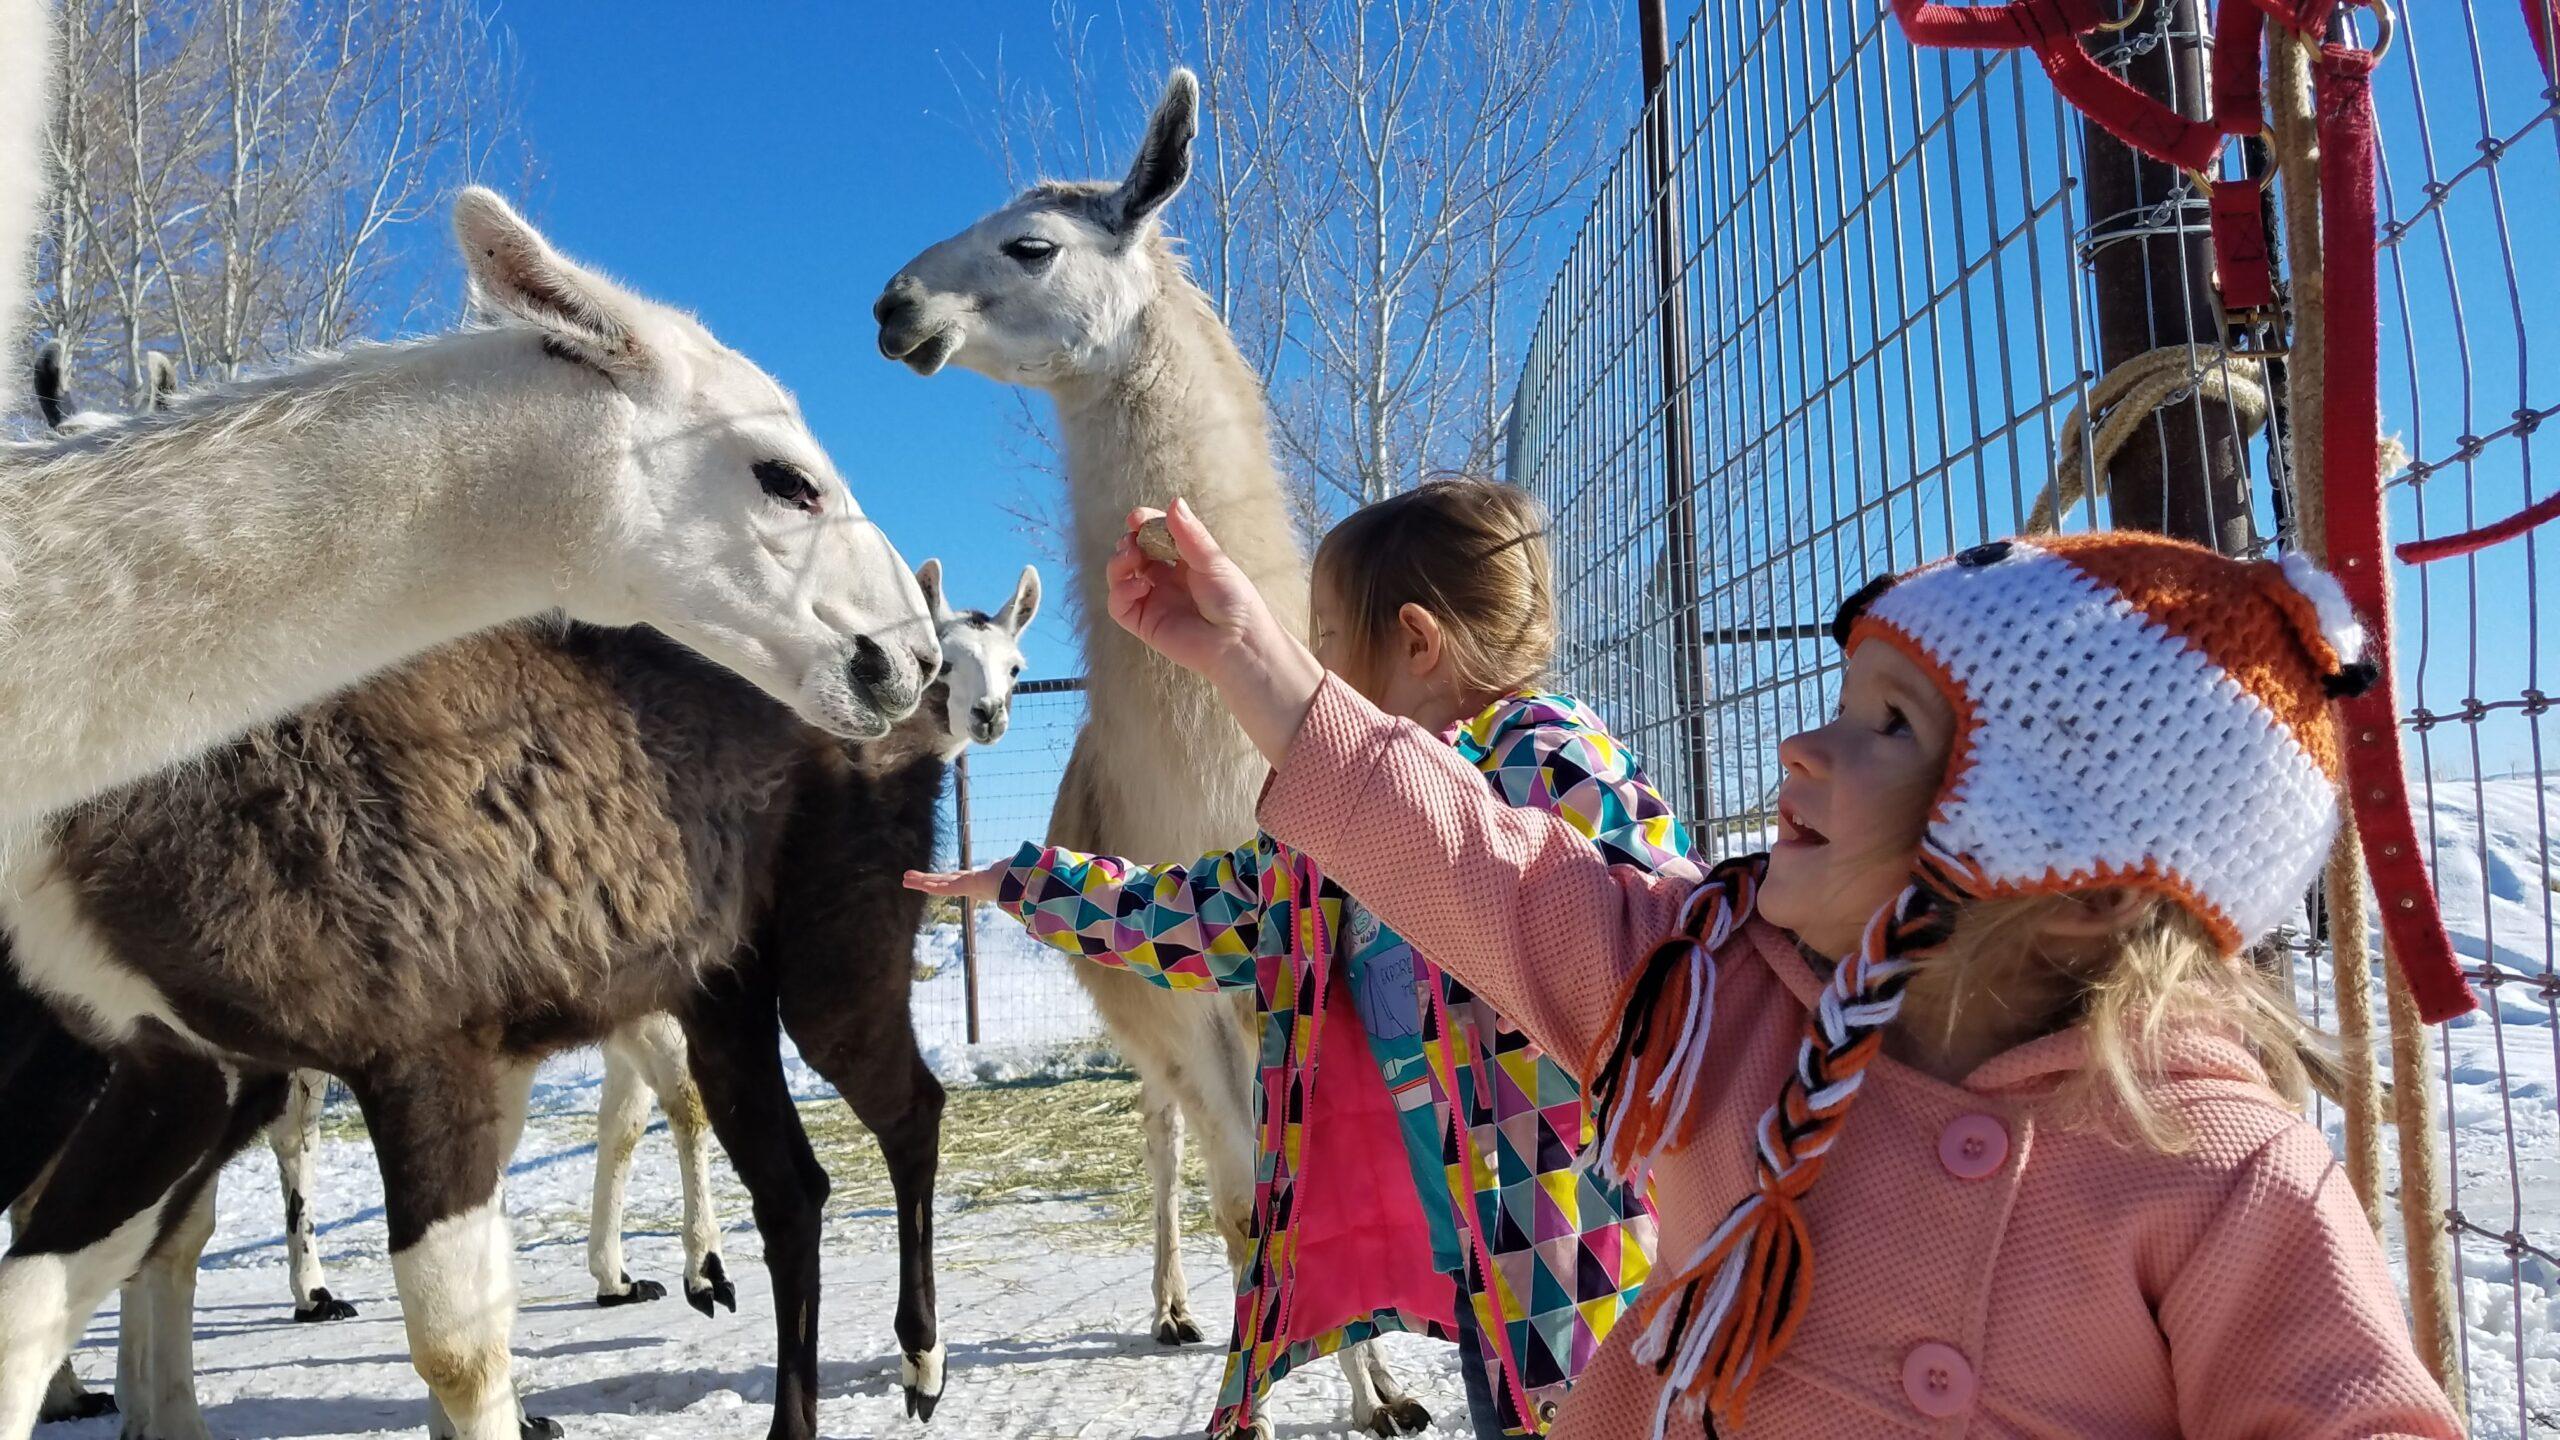 The Mini-Venture Llama Tour